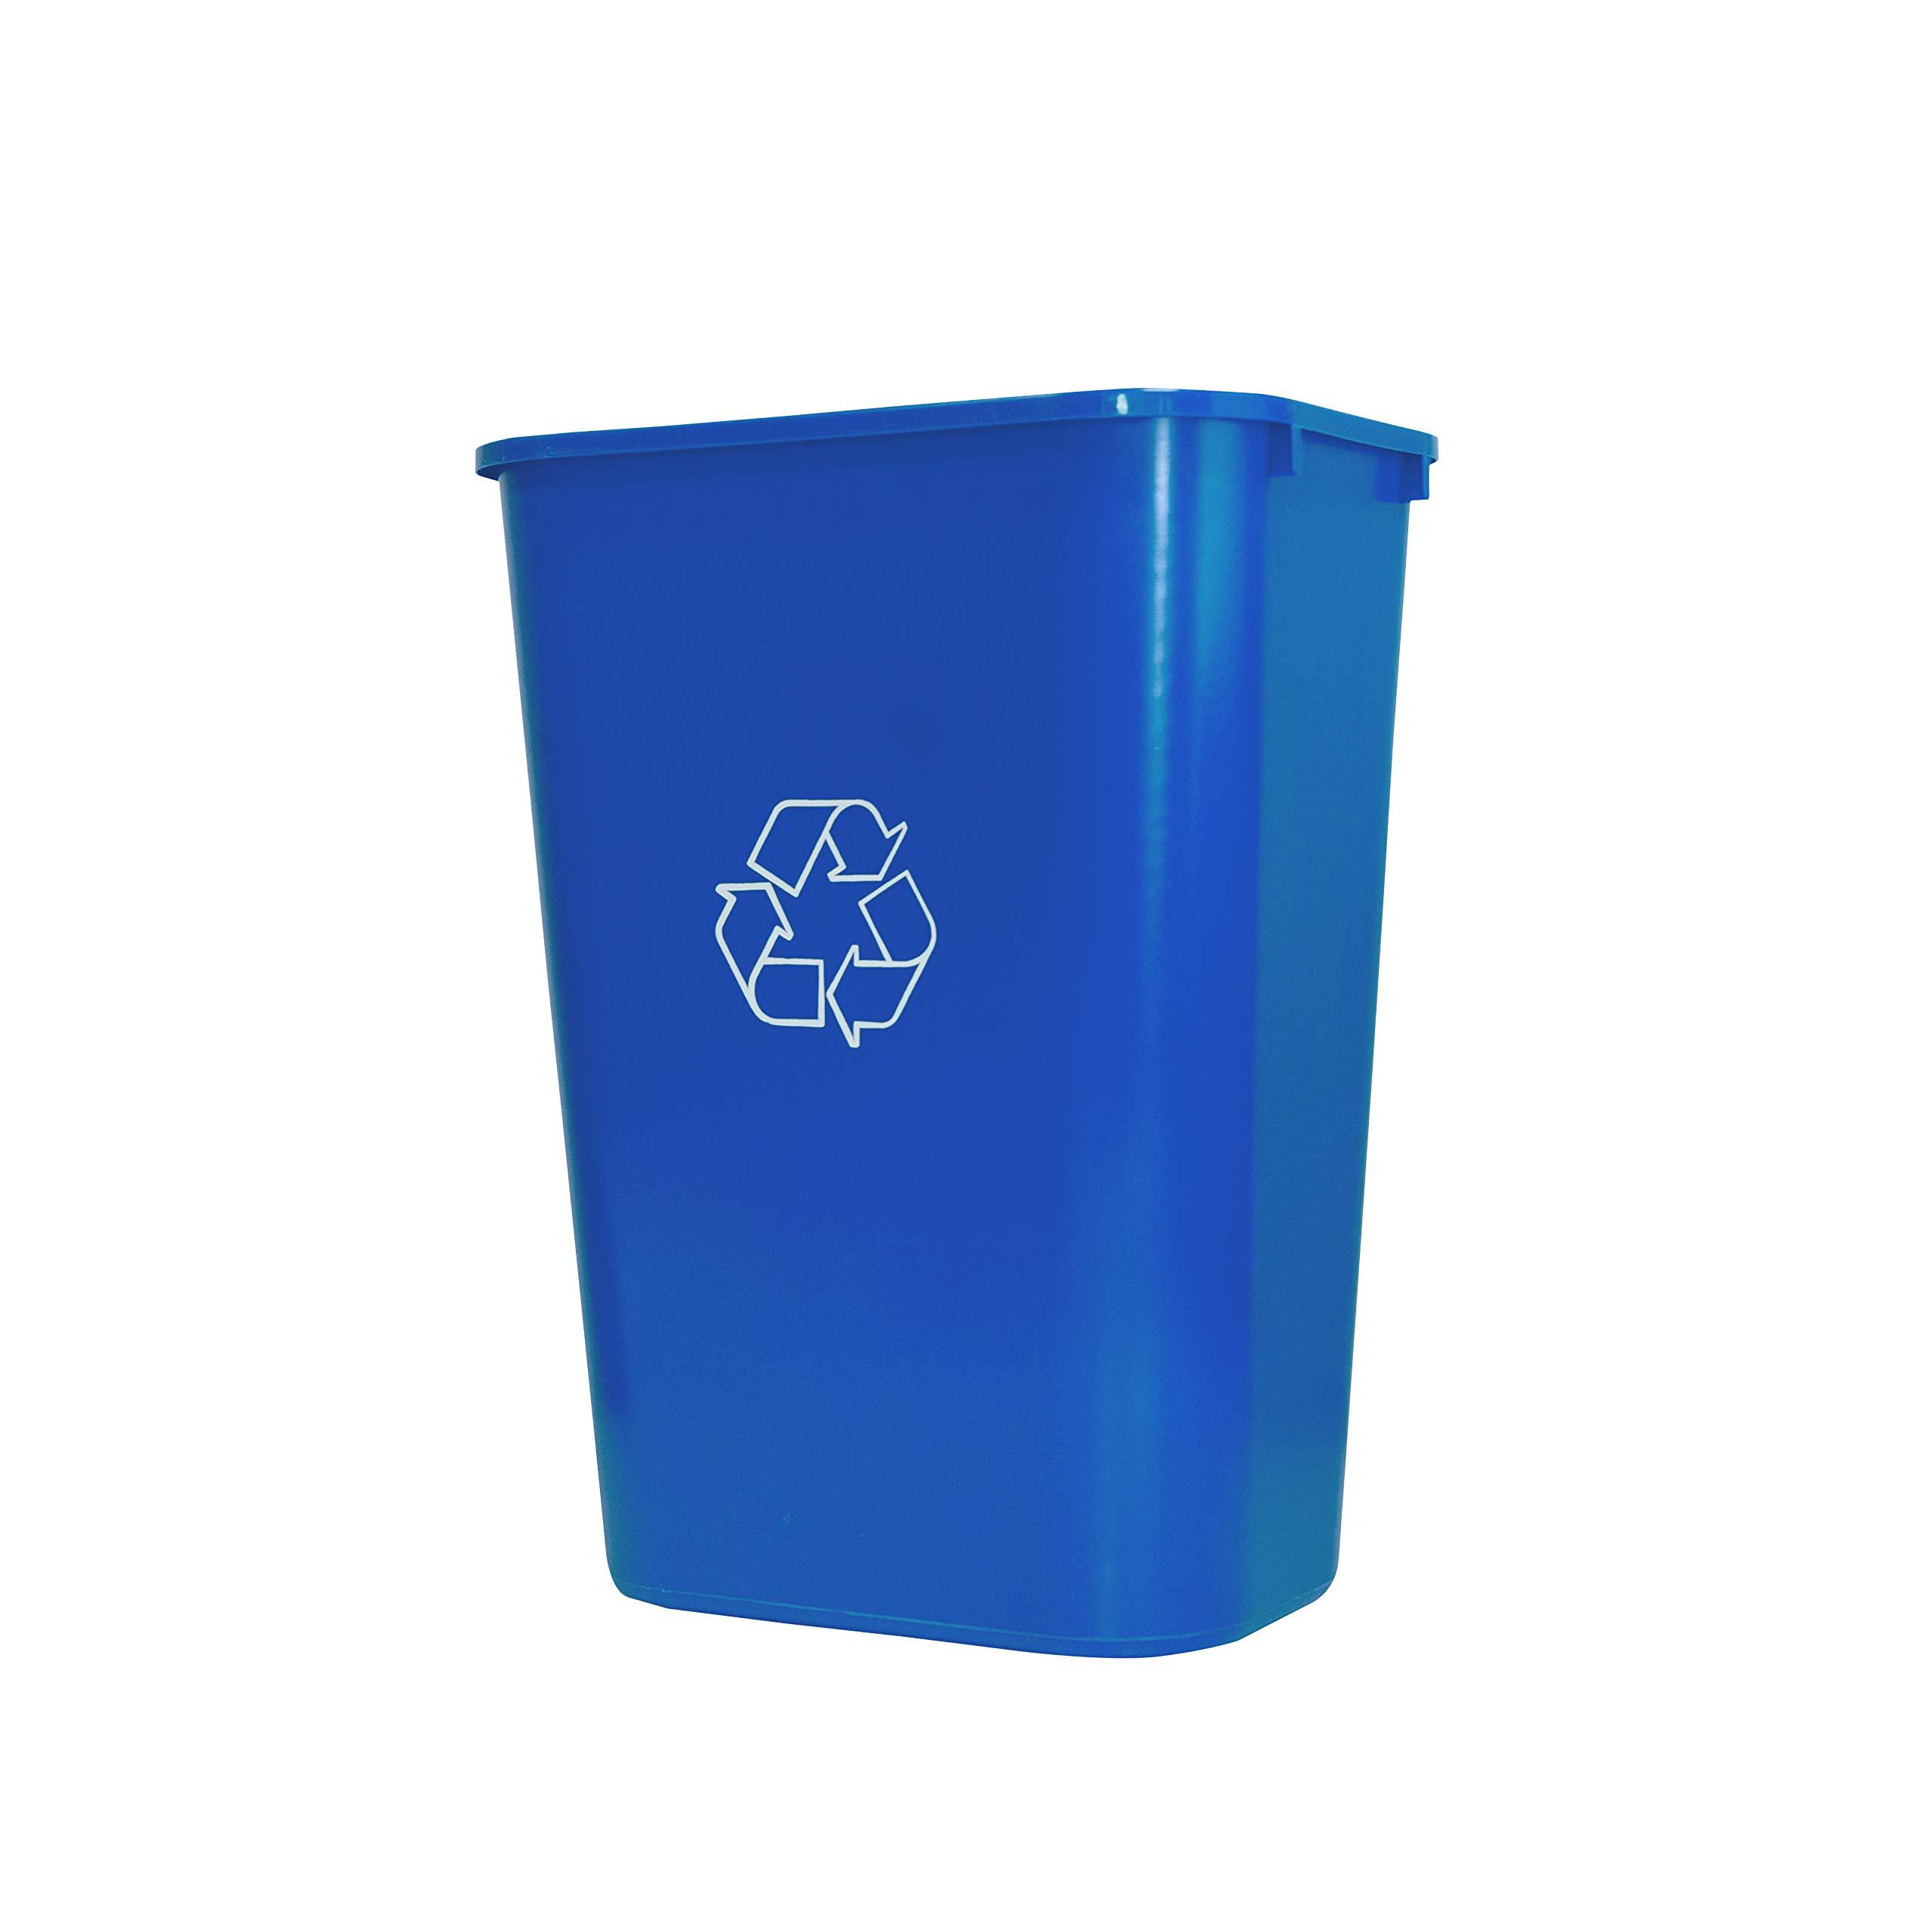 Planet Friendly 41 Quart/39 Liter Tall Recycler